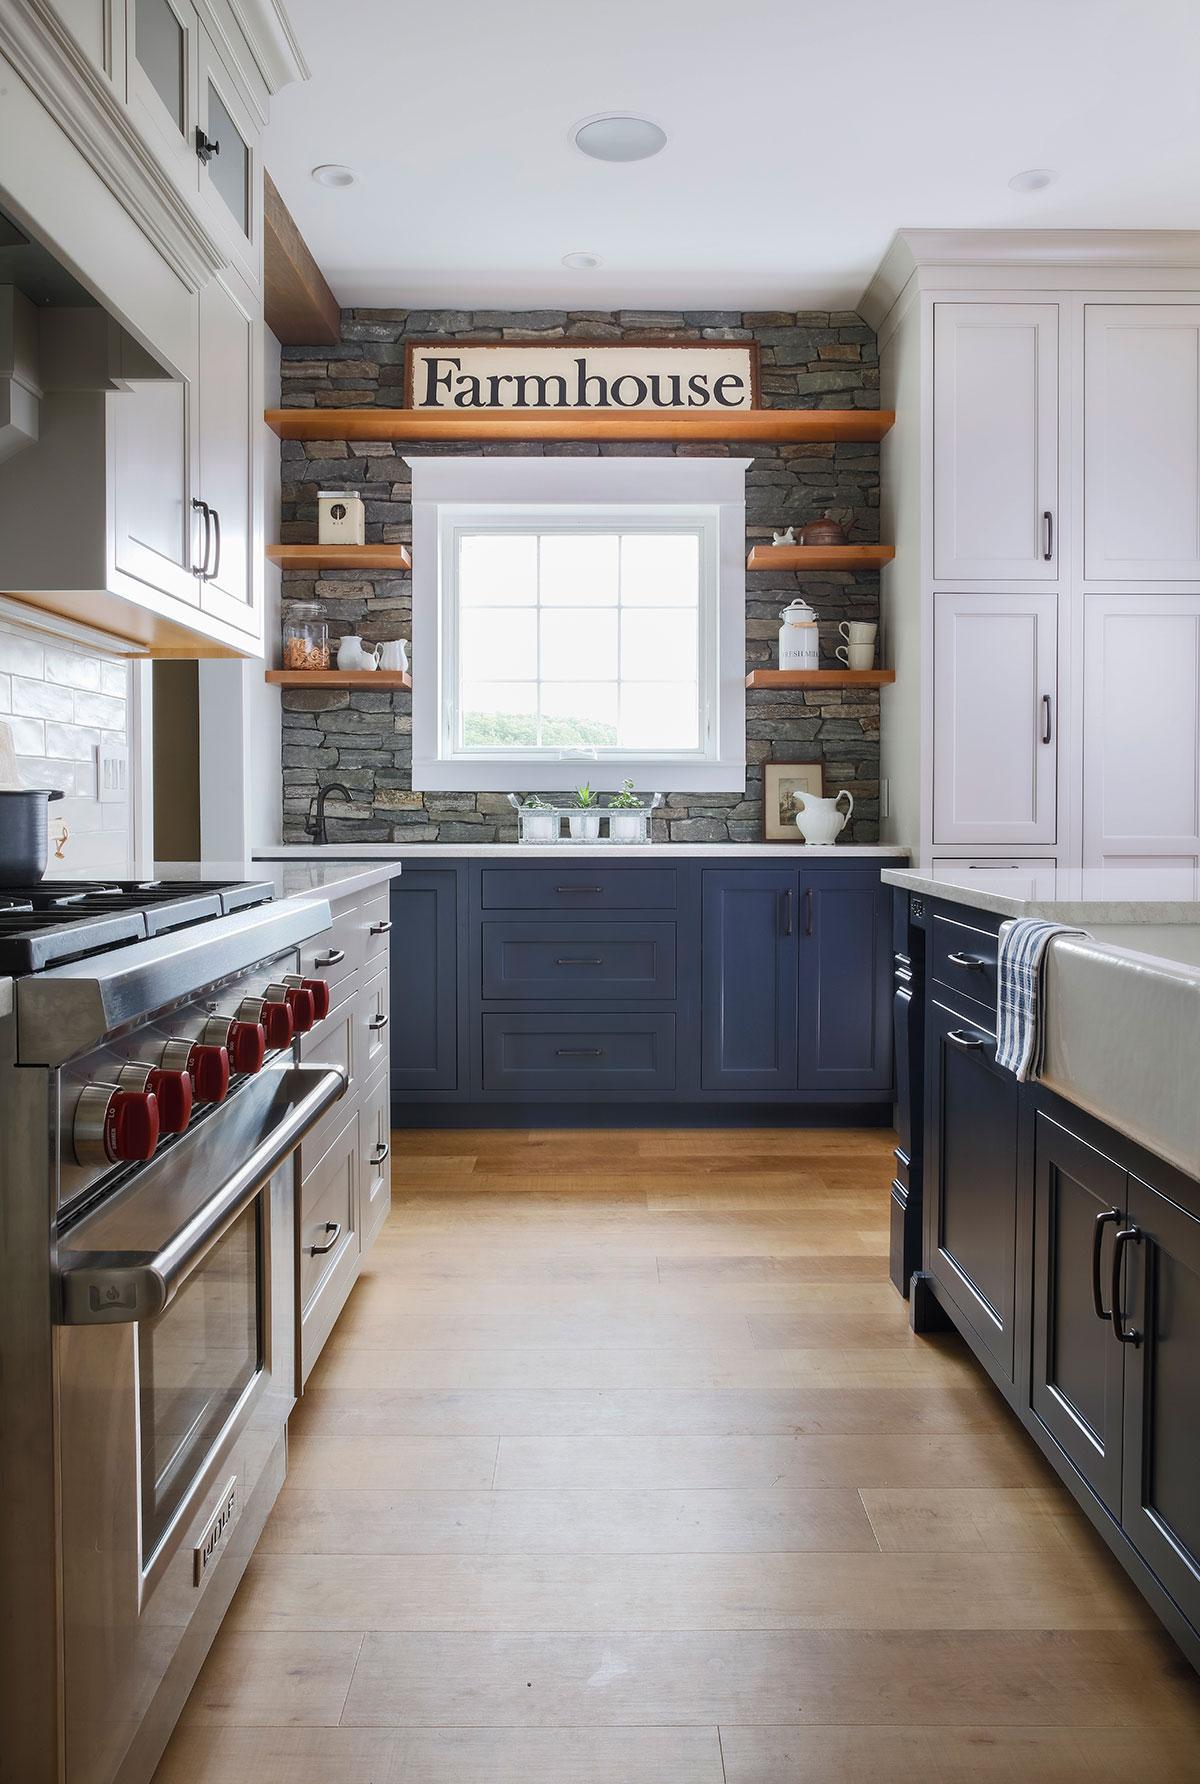 farmhouse-traditional-kitchen-bar-sink-window.jpg